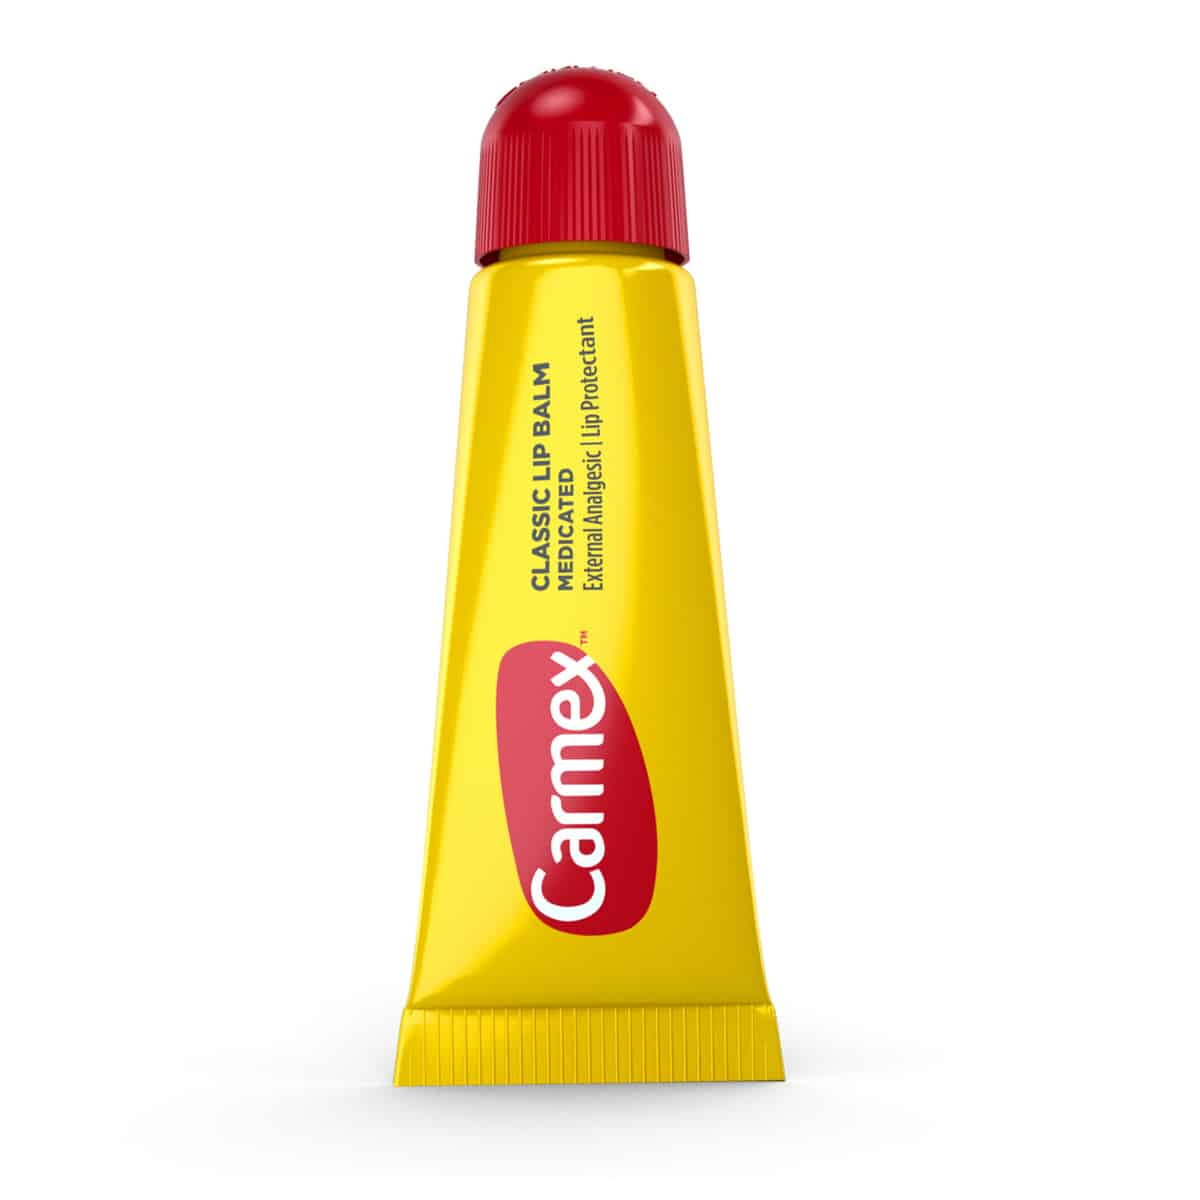 Carmex Classic Medicated Lip Balm Tube